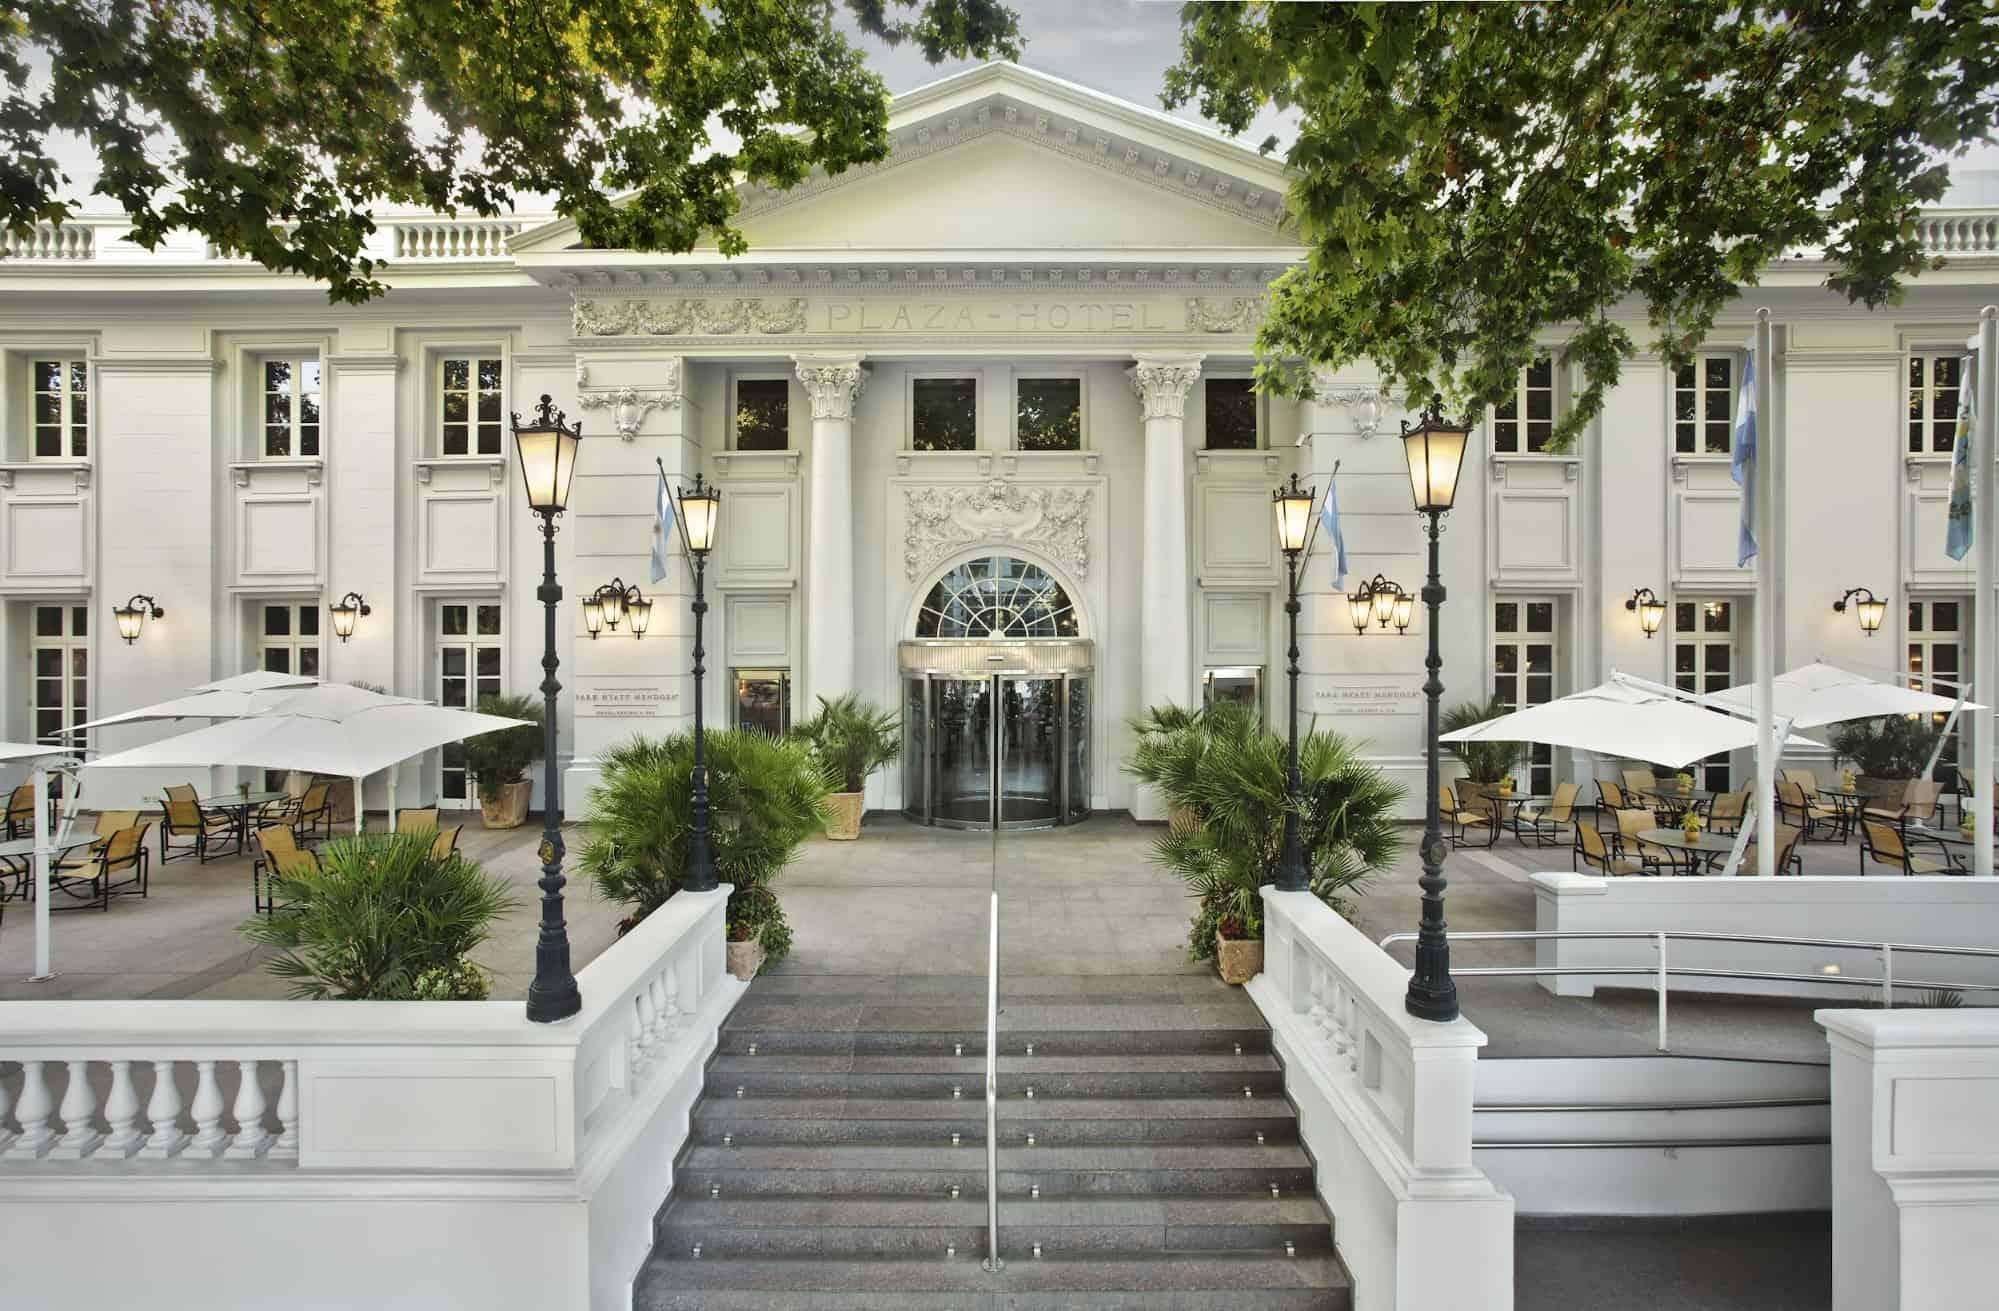 best hyatt hotels in the world for free nights-argentina-Park Hyatt Mendoza